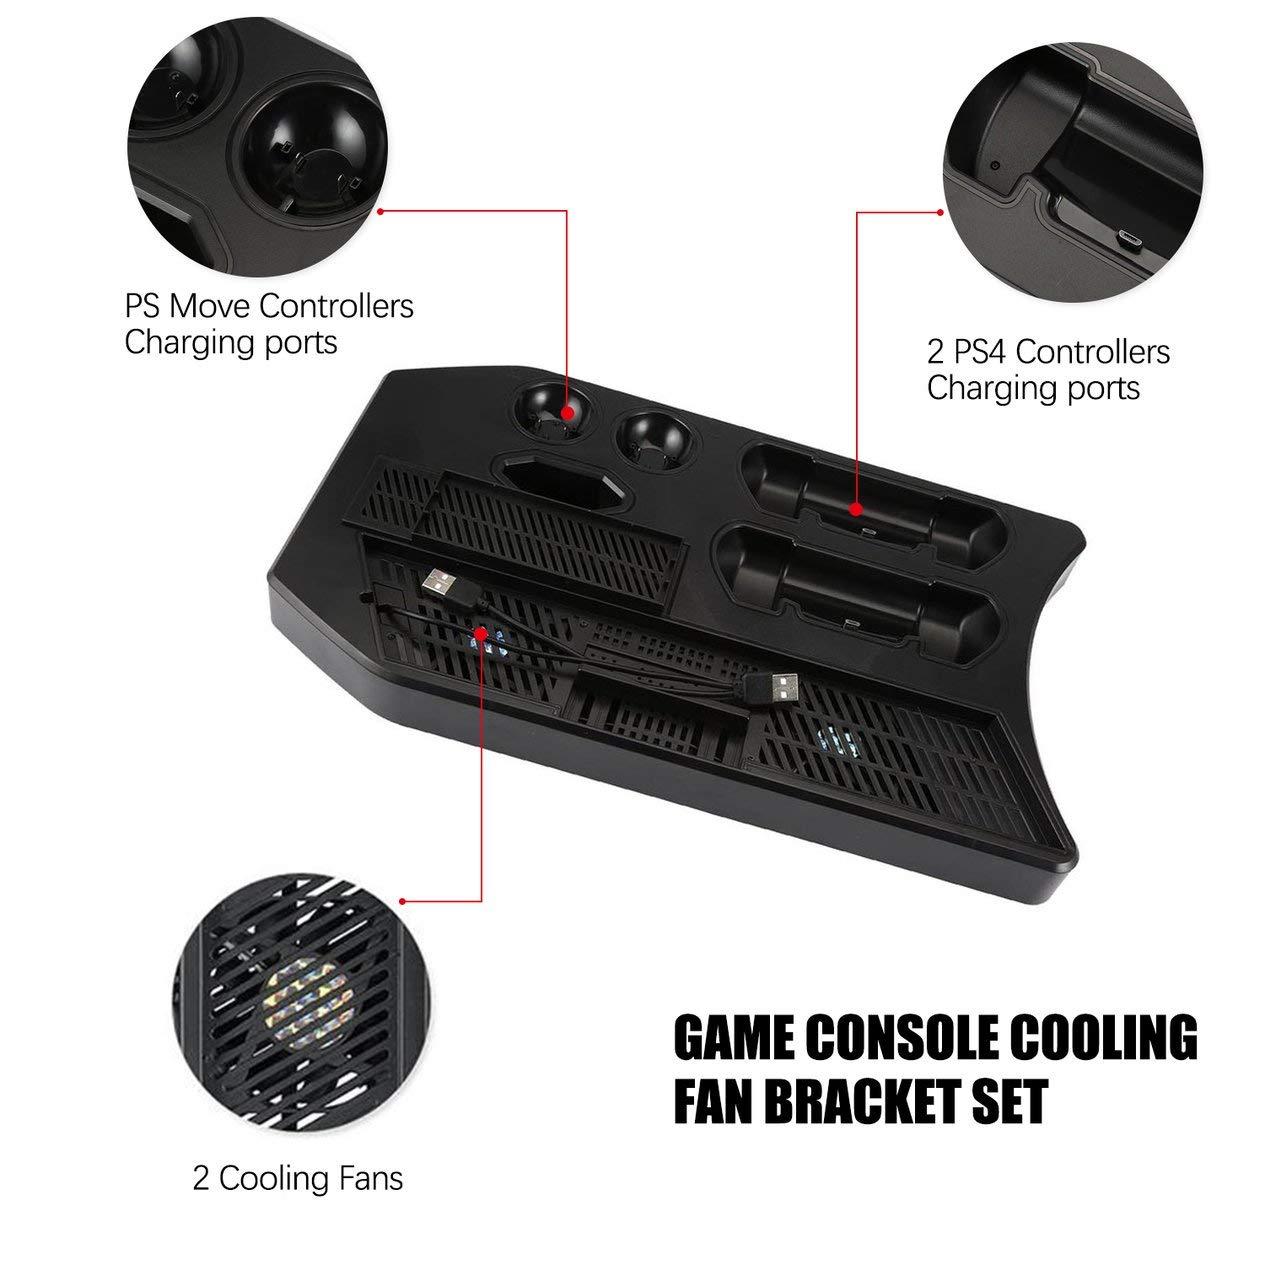 PSVR2-schwarz BCVBFGCXVB KJH Charger Controller Vertikaler St/änder Gamepad Ladestation Konsolenk/ühler f/ür PS Move f/ür PS4 Slim f/ür PS4 Pro f/ür PSVR